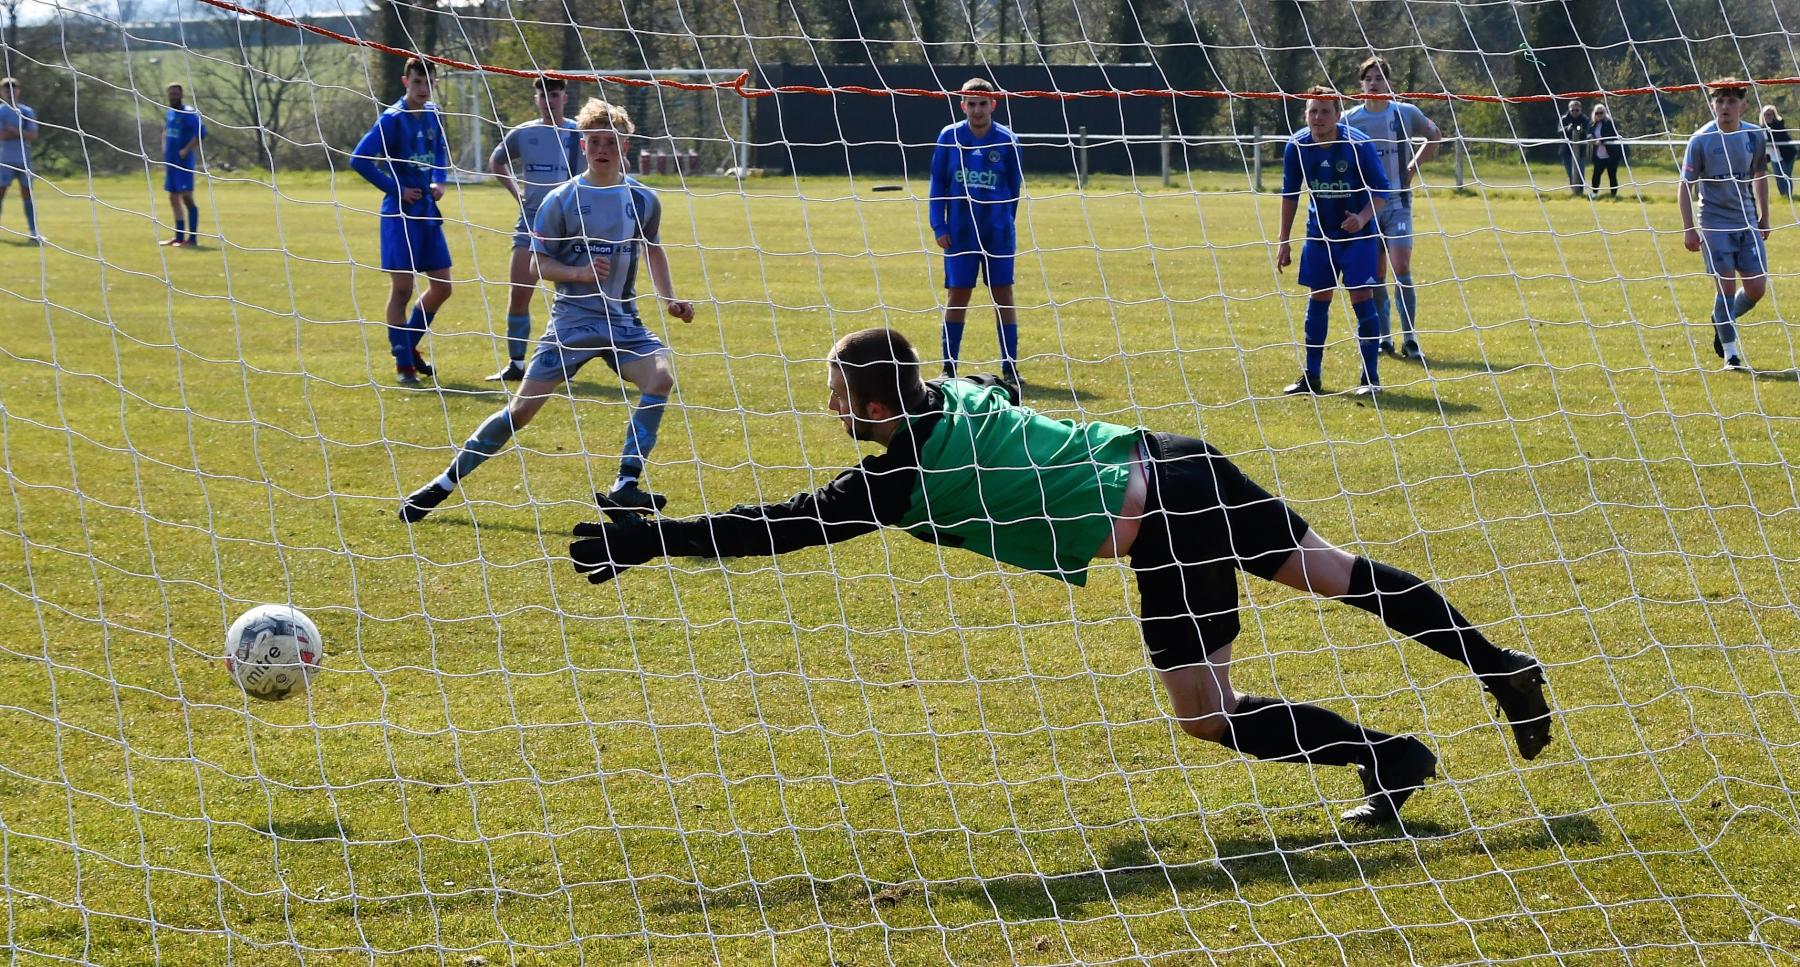 Elliot-Lowries-penalty-was-disallowed-Ben-Challis